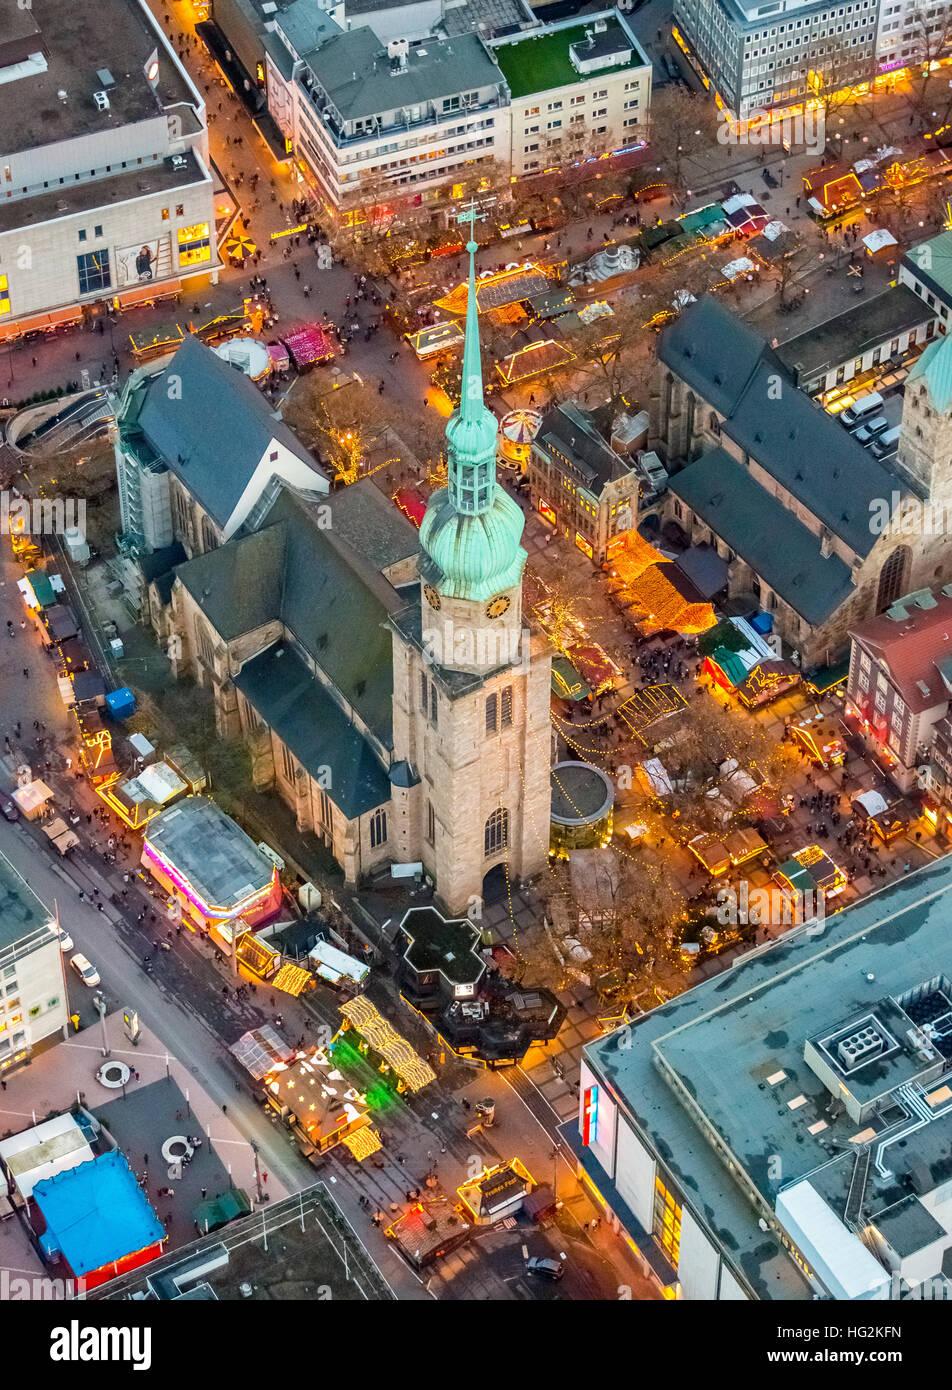 Aerial photo, Christmas market at the Reinoldi church, Ev. Parish Saint Mary, Dortmund, Ruhr aeria, north rhine - Stock Image